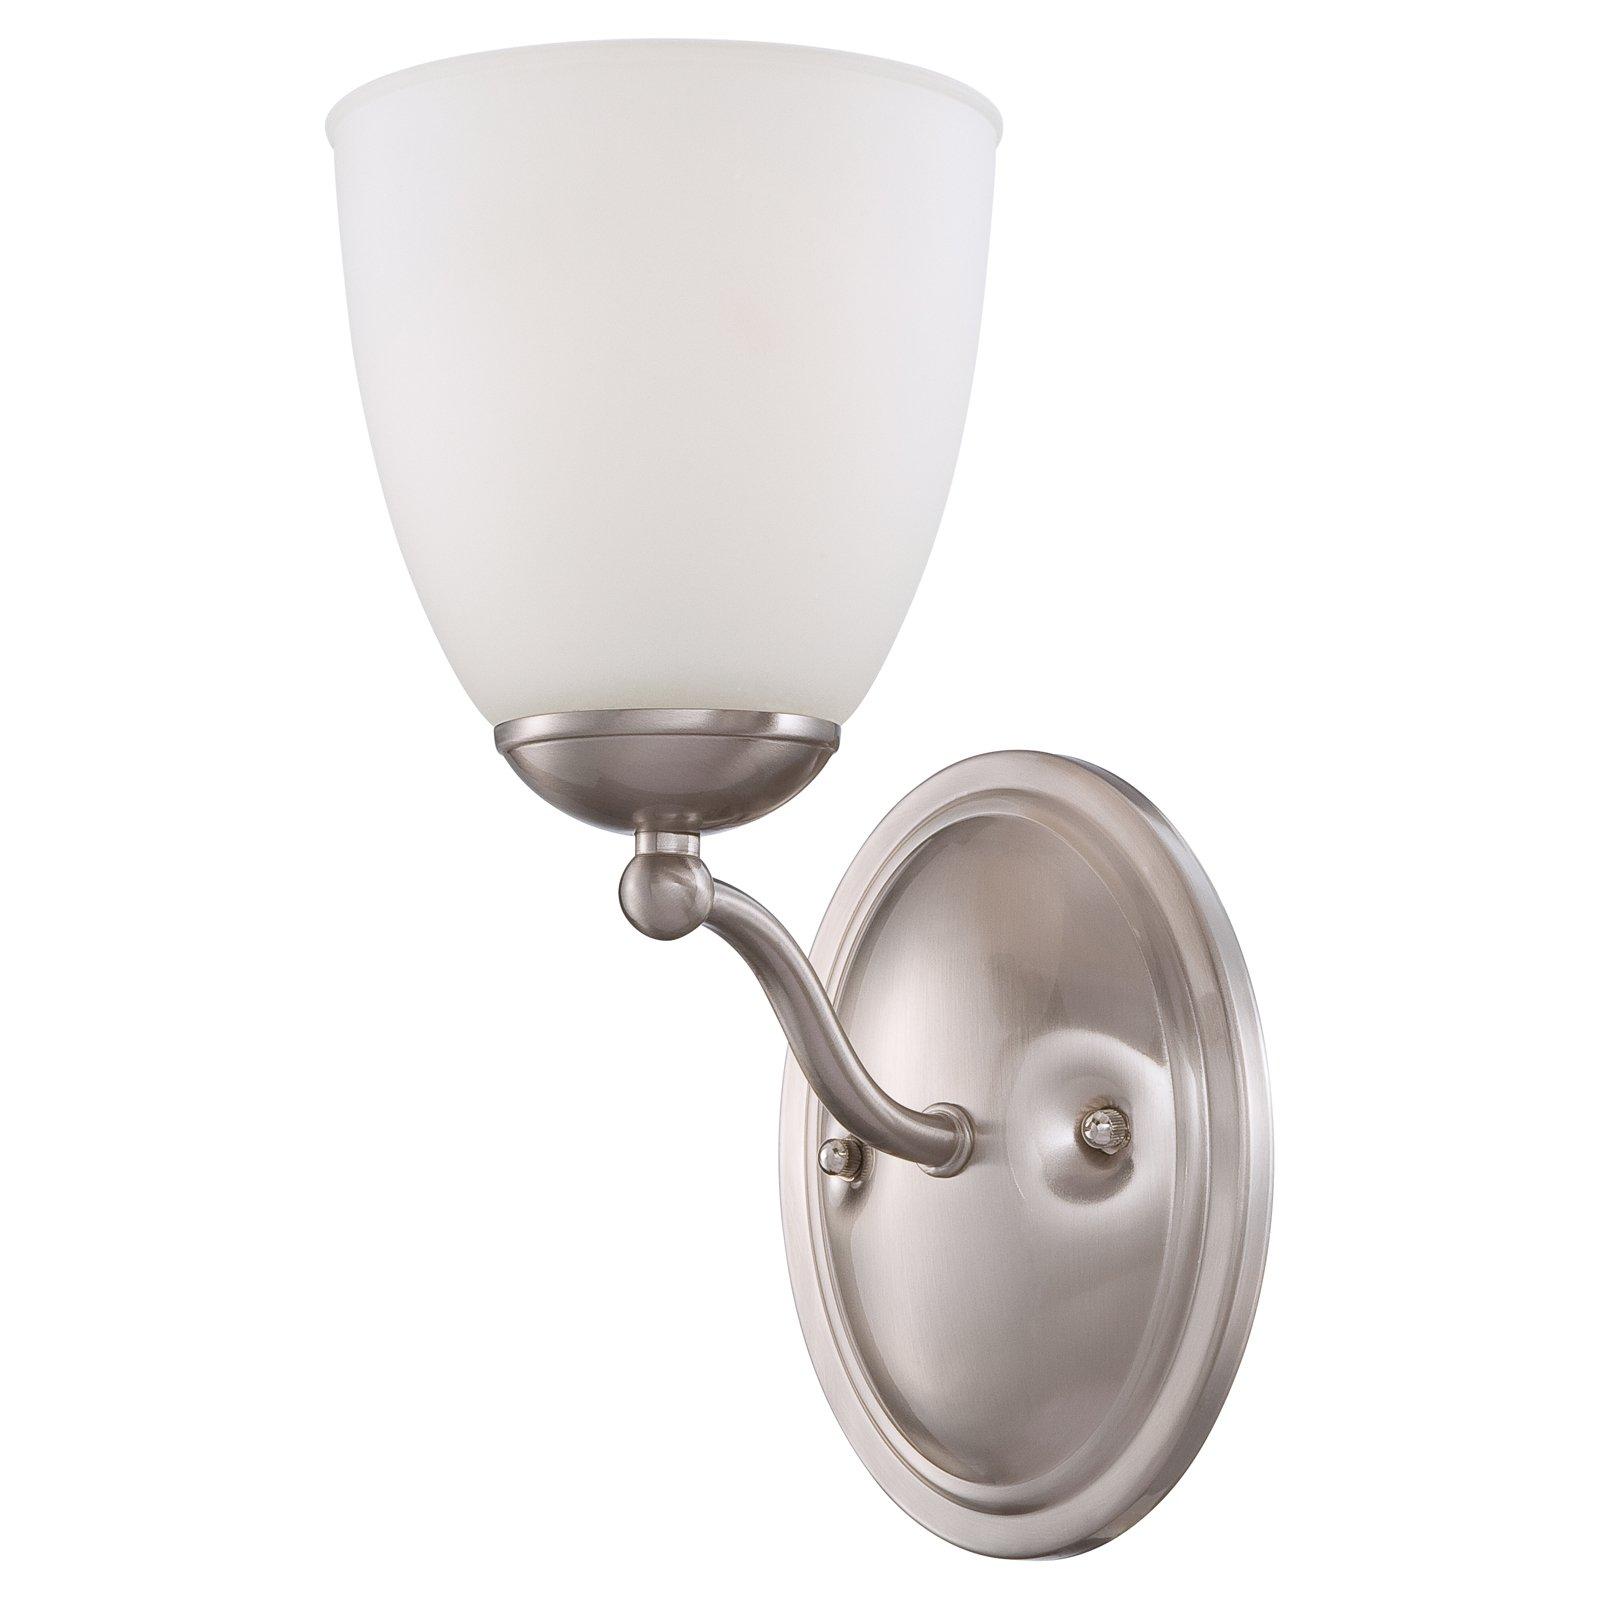 Photo of Nuvo 60/5 Patton 1 Light Bathroom Vanity Light Prairie Bronze